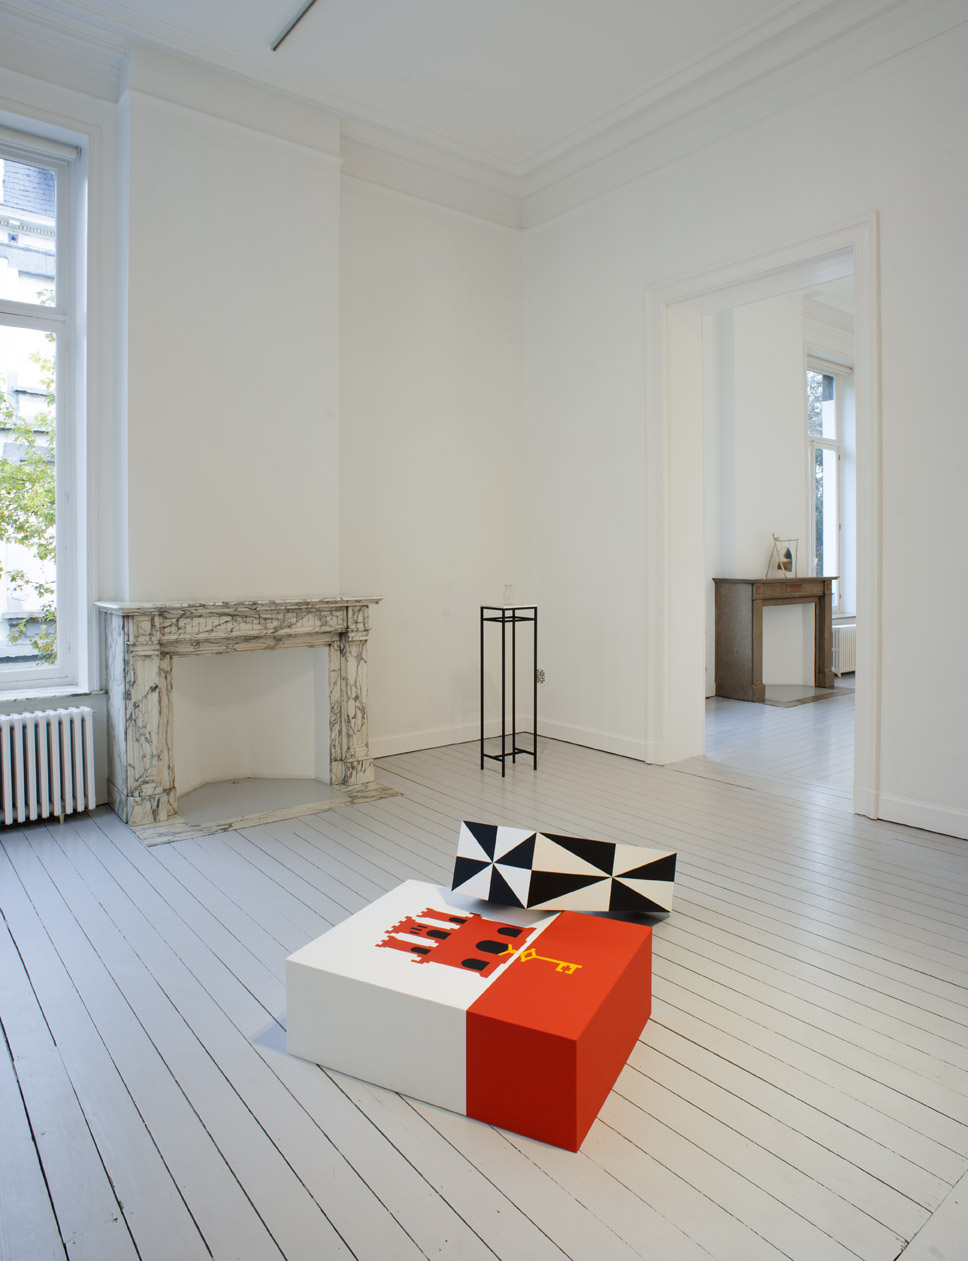 Kasper Bosmans, Installation view